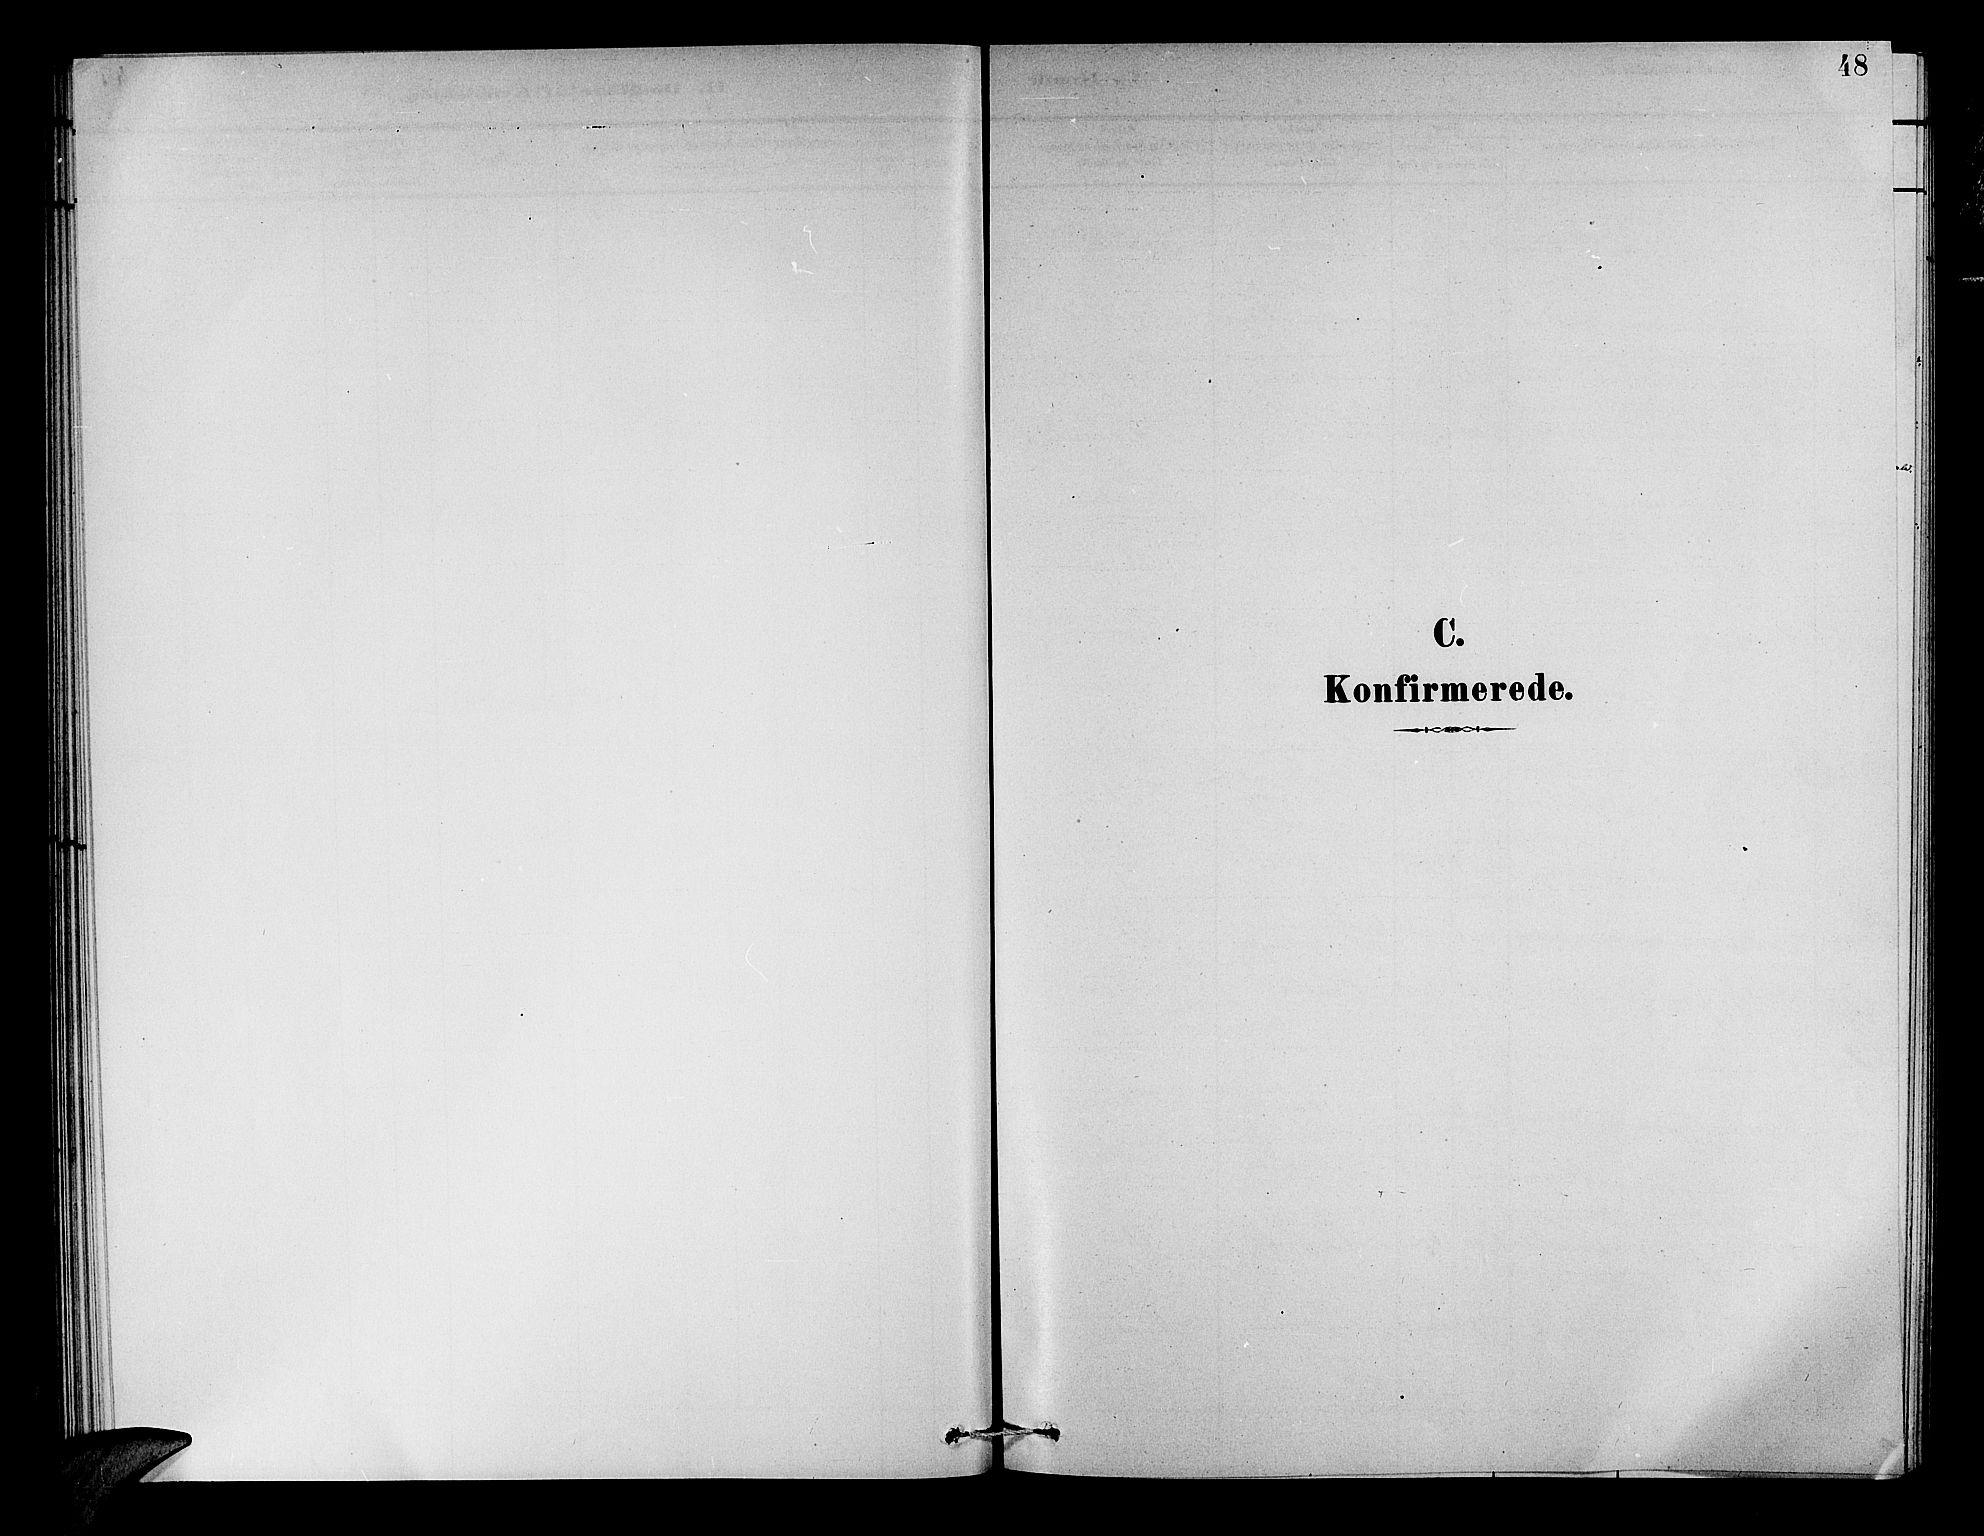 SAB, Aurland Sokneprestembete*, Klokkerbok nr. A 2, 1880-1895, s. 48